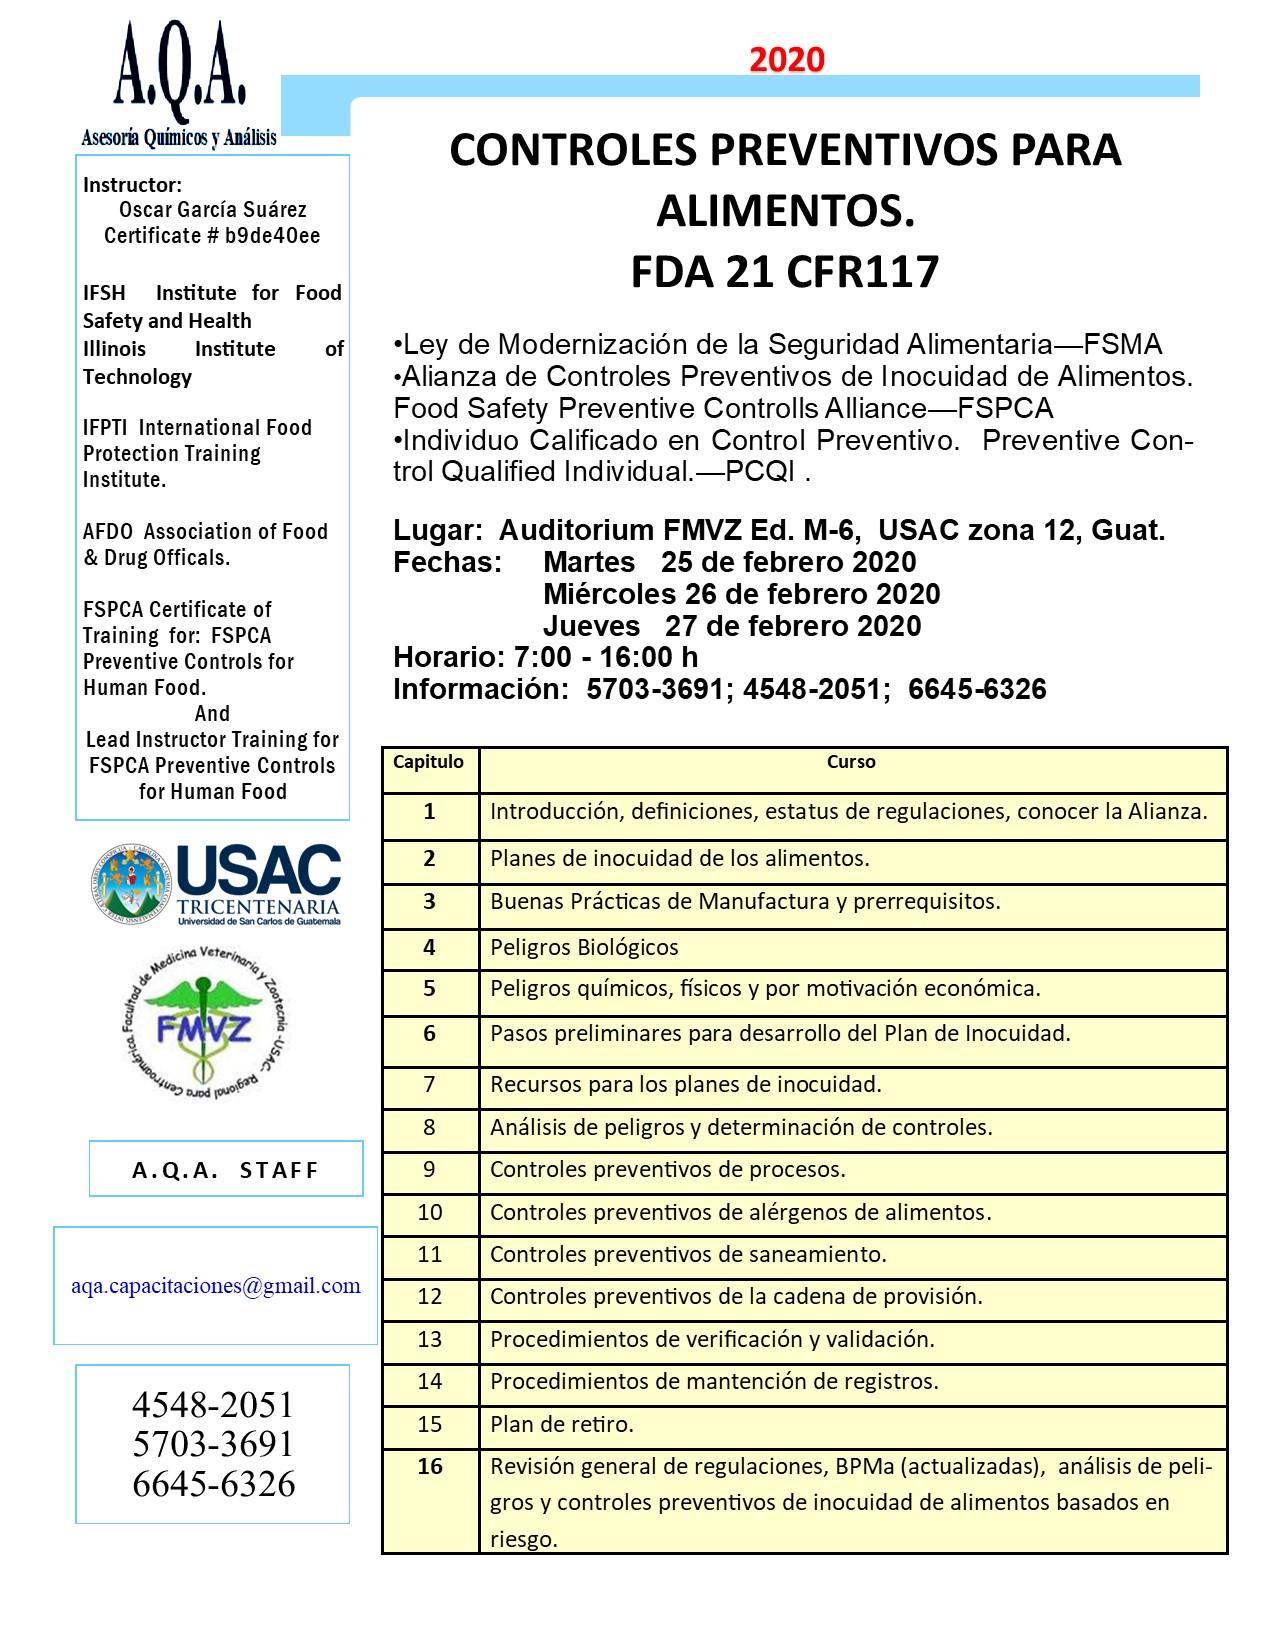 CURSO Ley de Modernidad Alimentaria  CONTROLES PREVENTIVOS PARA ALIMENTOS. FDA 21 CFR117